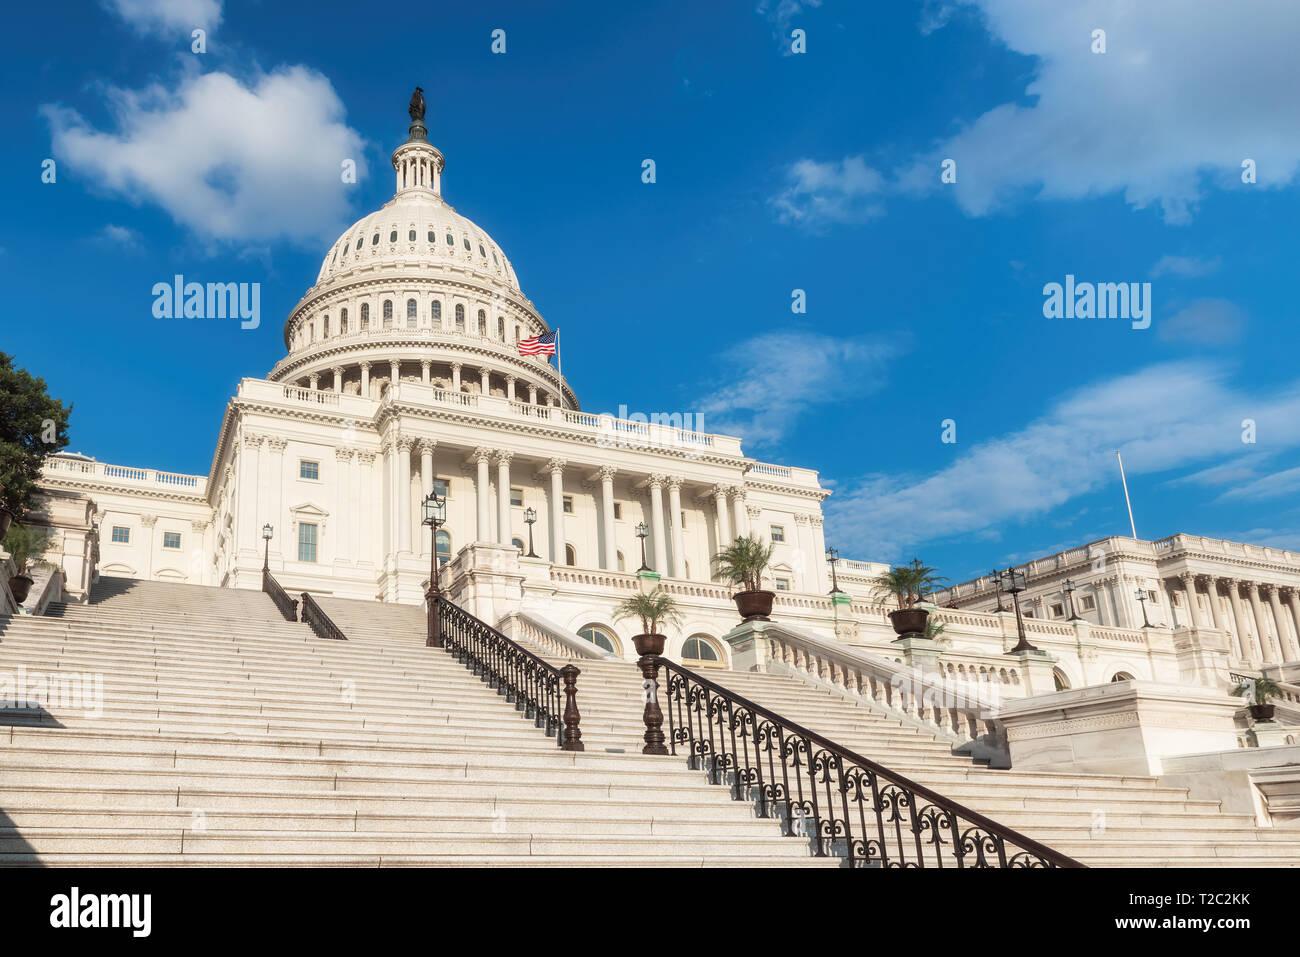 United States Capitol Building, Washington DC, USA. Banque D'Images